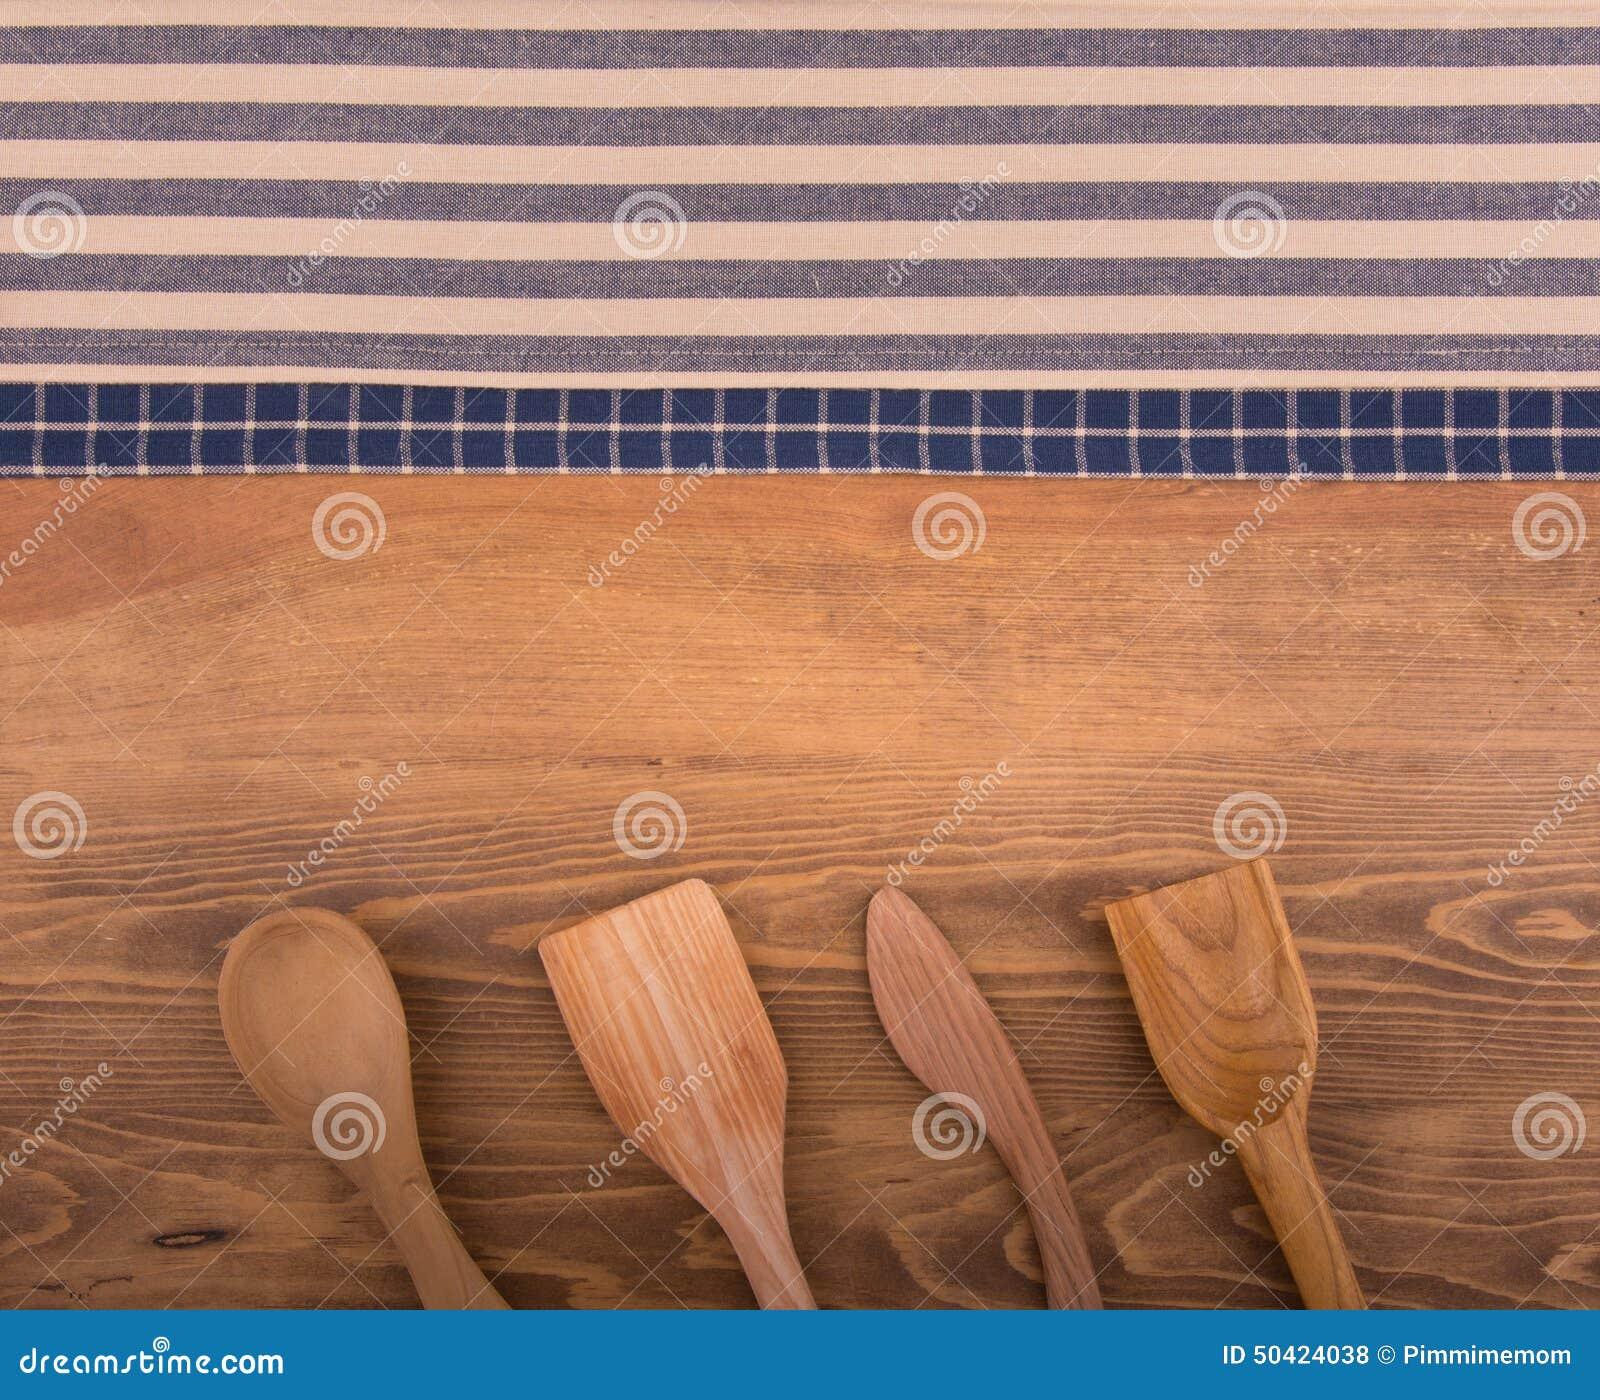 Blue and white kitchen towels - Background Blue Center Dark Kitchen Off Room Text Towels Utensils White